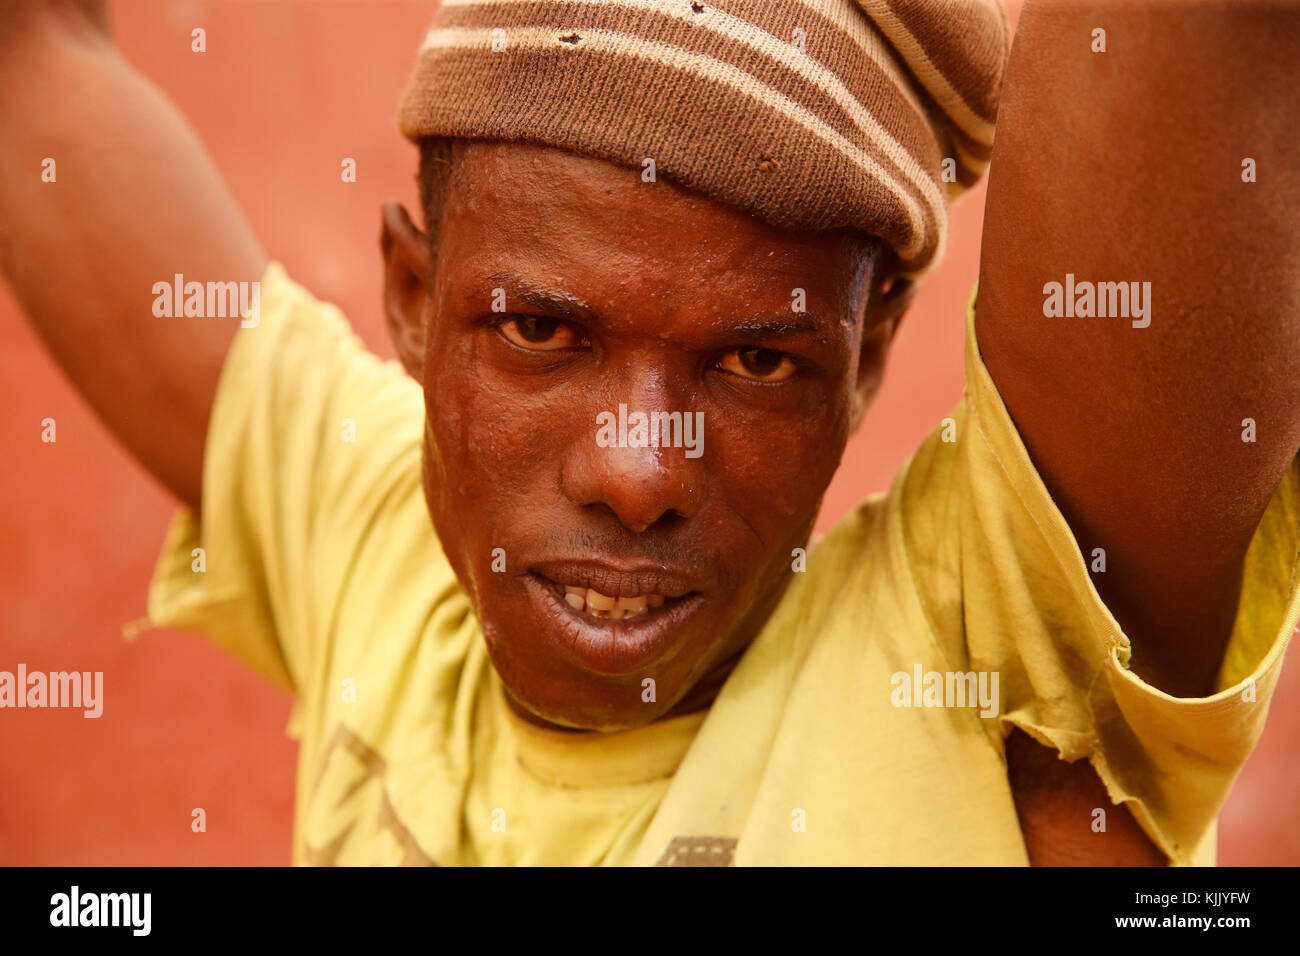 Trabajador. Senegal. Imagen De Stock